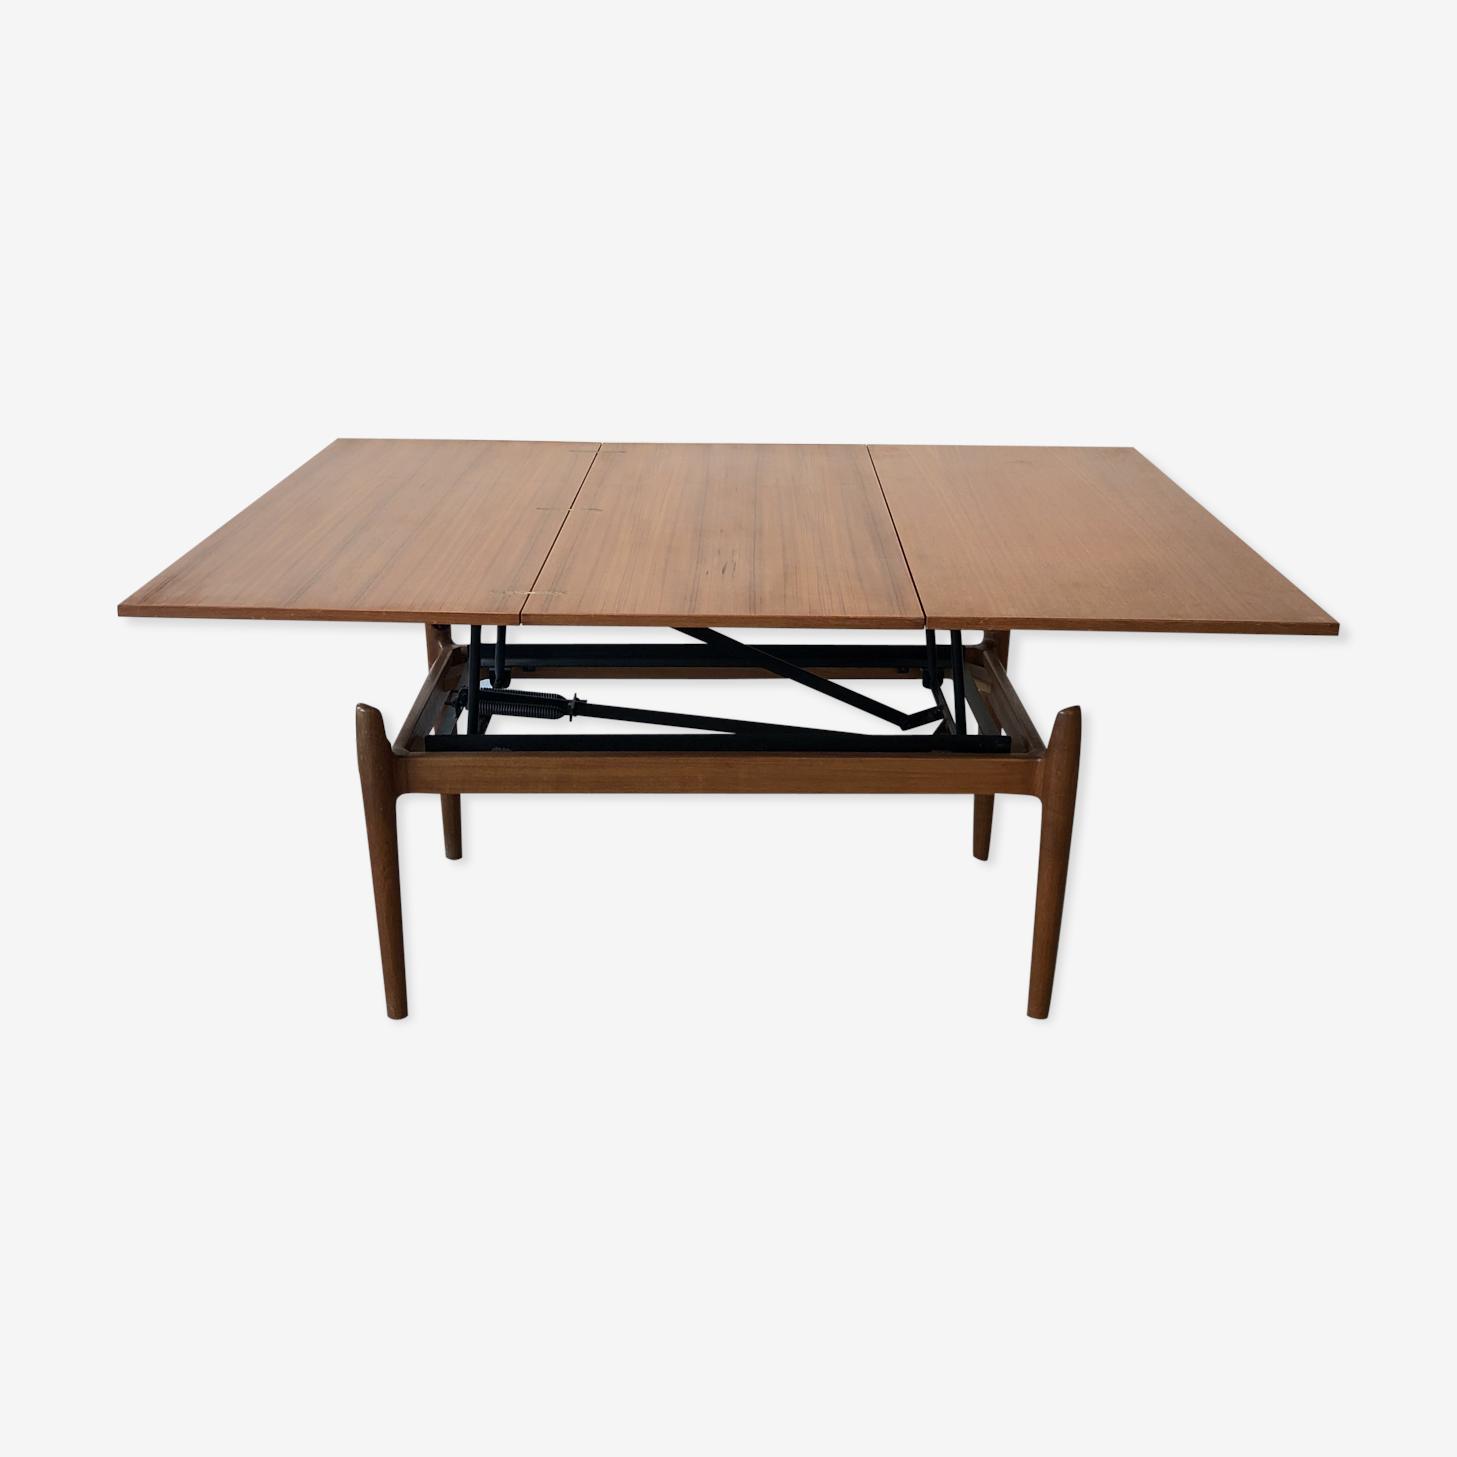 Table basse convertible scandinave